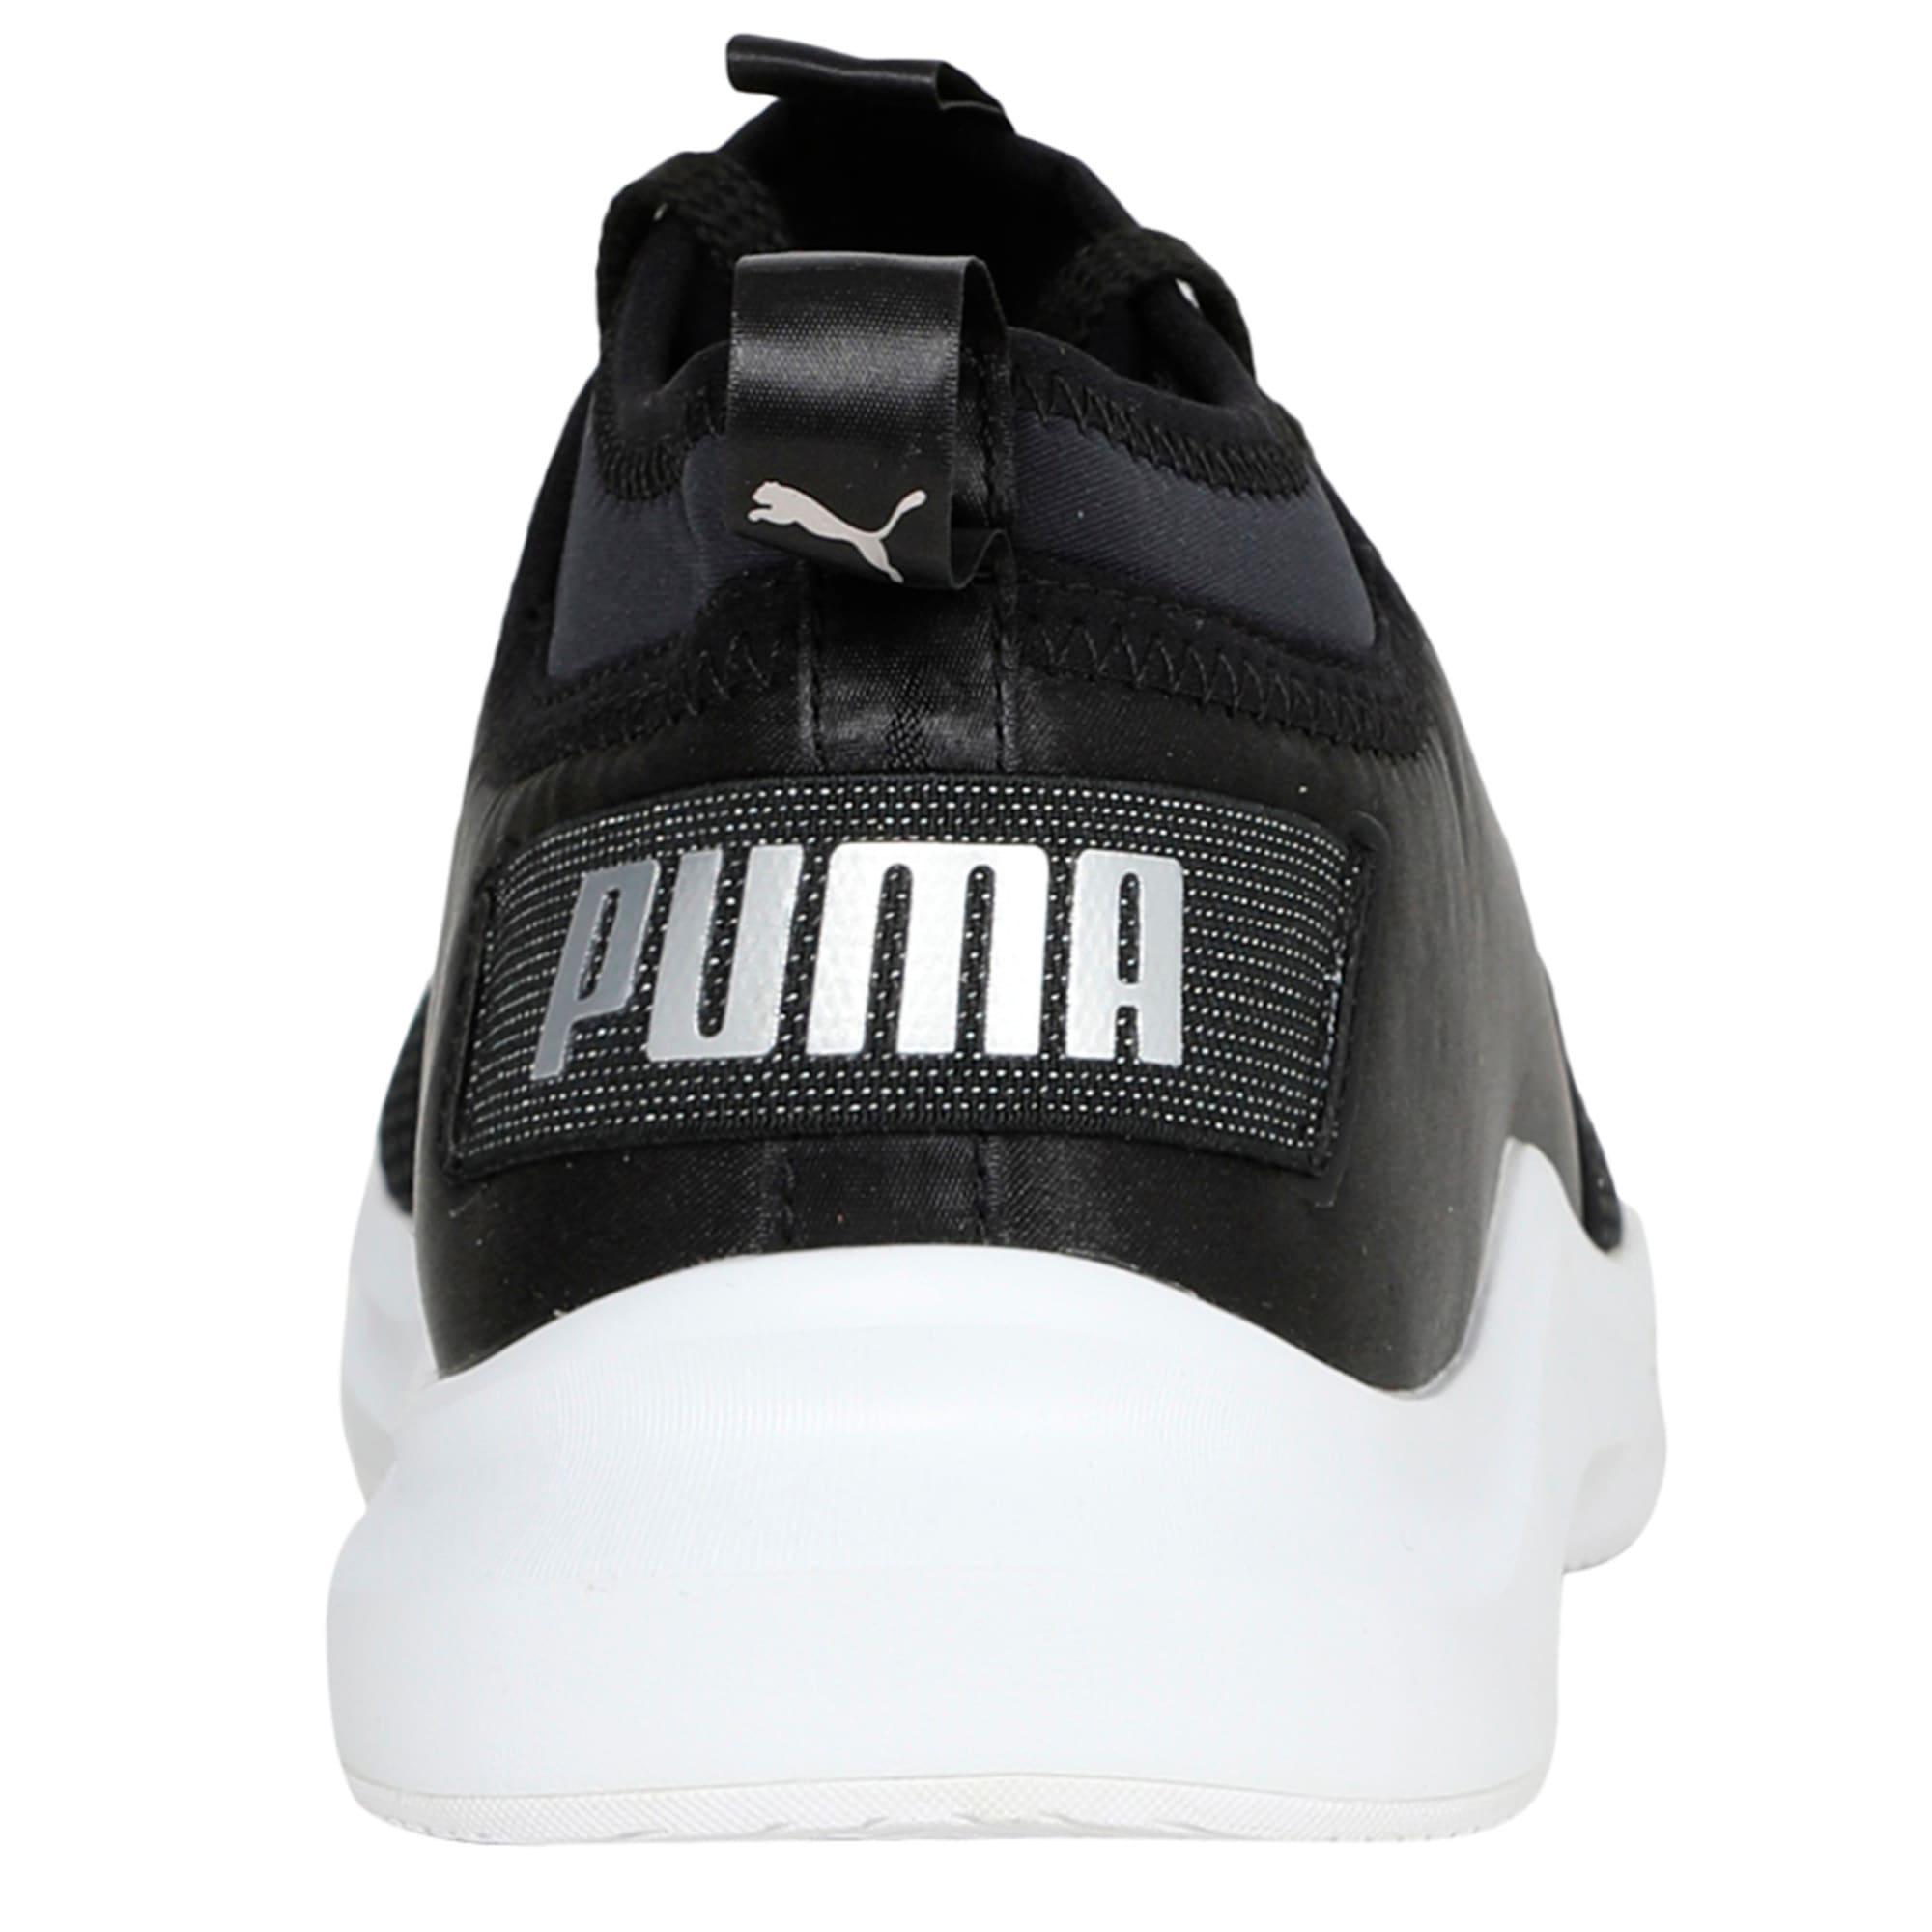 Thumbnail 4 of Phenom Satin Lo En Pointe Women's Training Shoes, Puma Black-Puma White, medium-IND